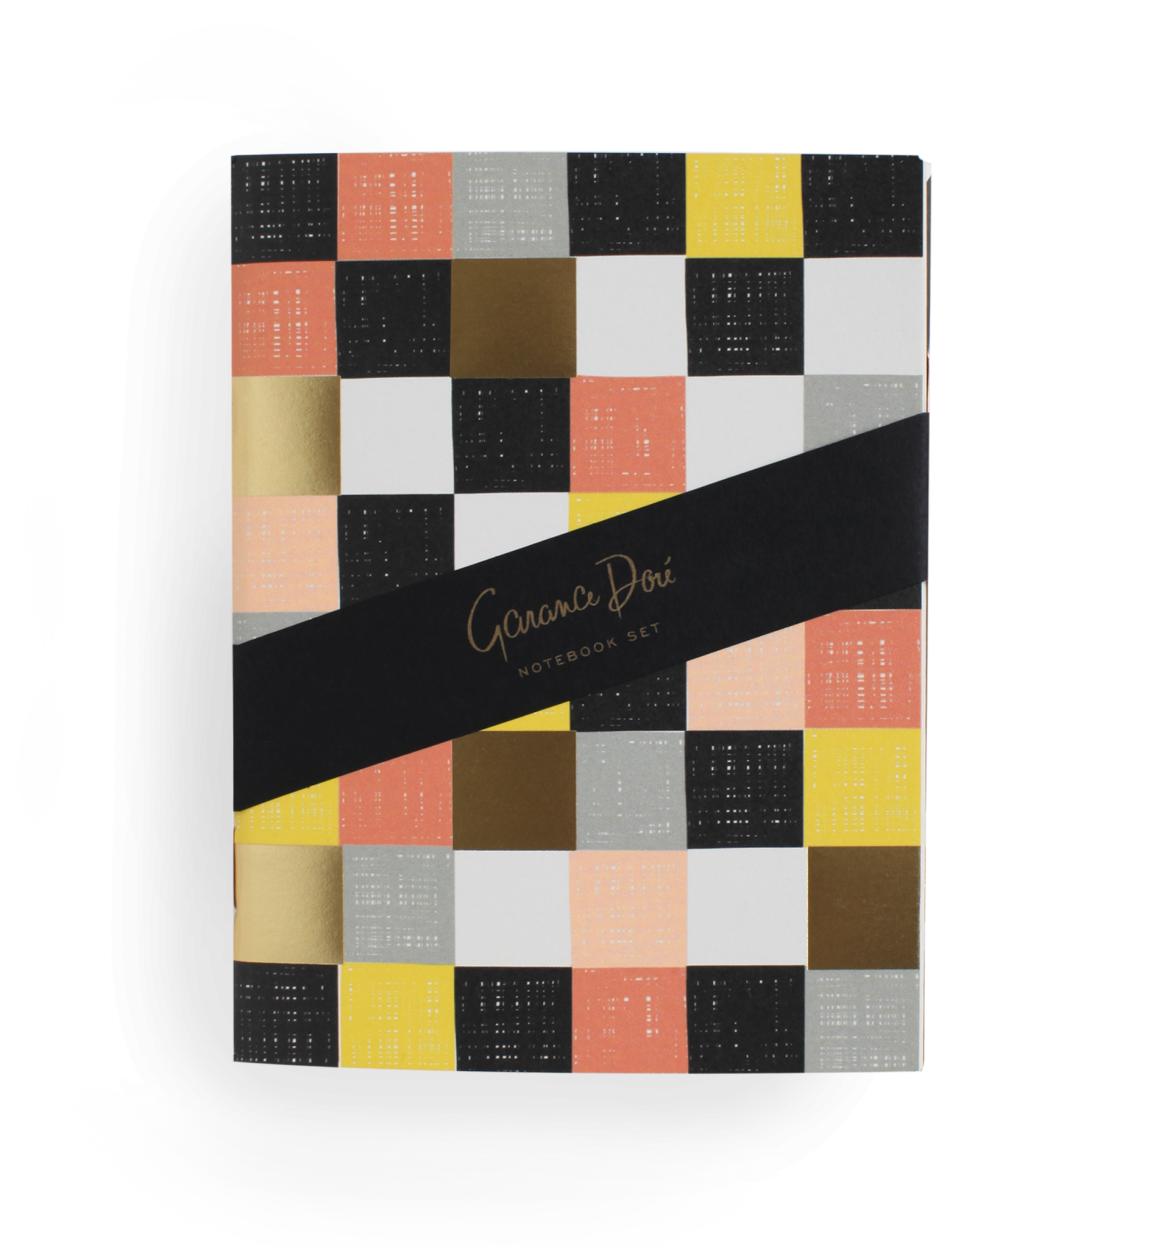 oui-pocket-notebook-set-02_1[1]